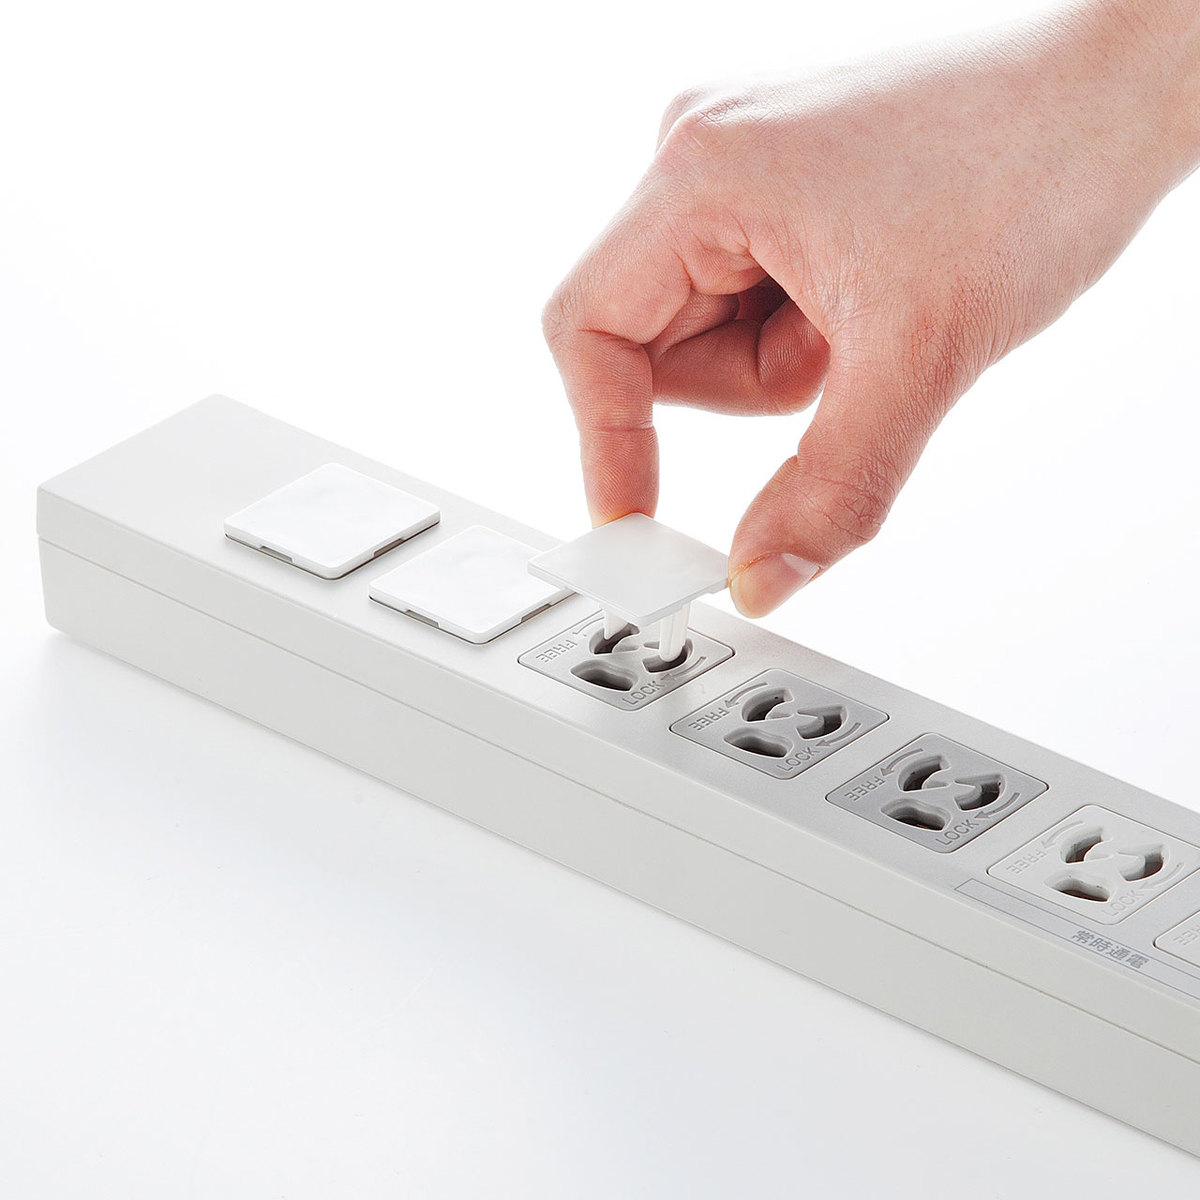 [TAP-CAP3P100L] コンセント安全キャップ 抜け止め用(3P・100個入り)